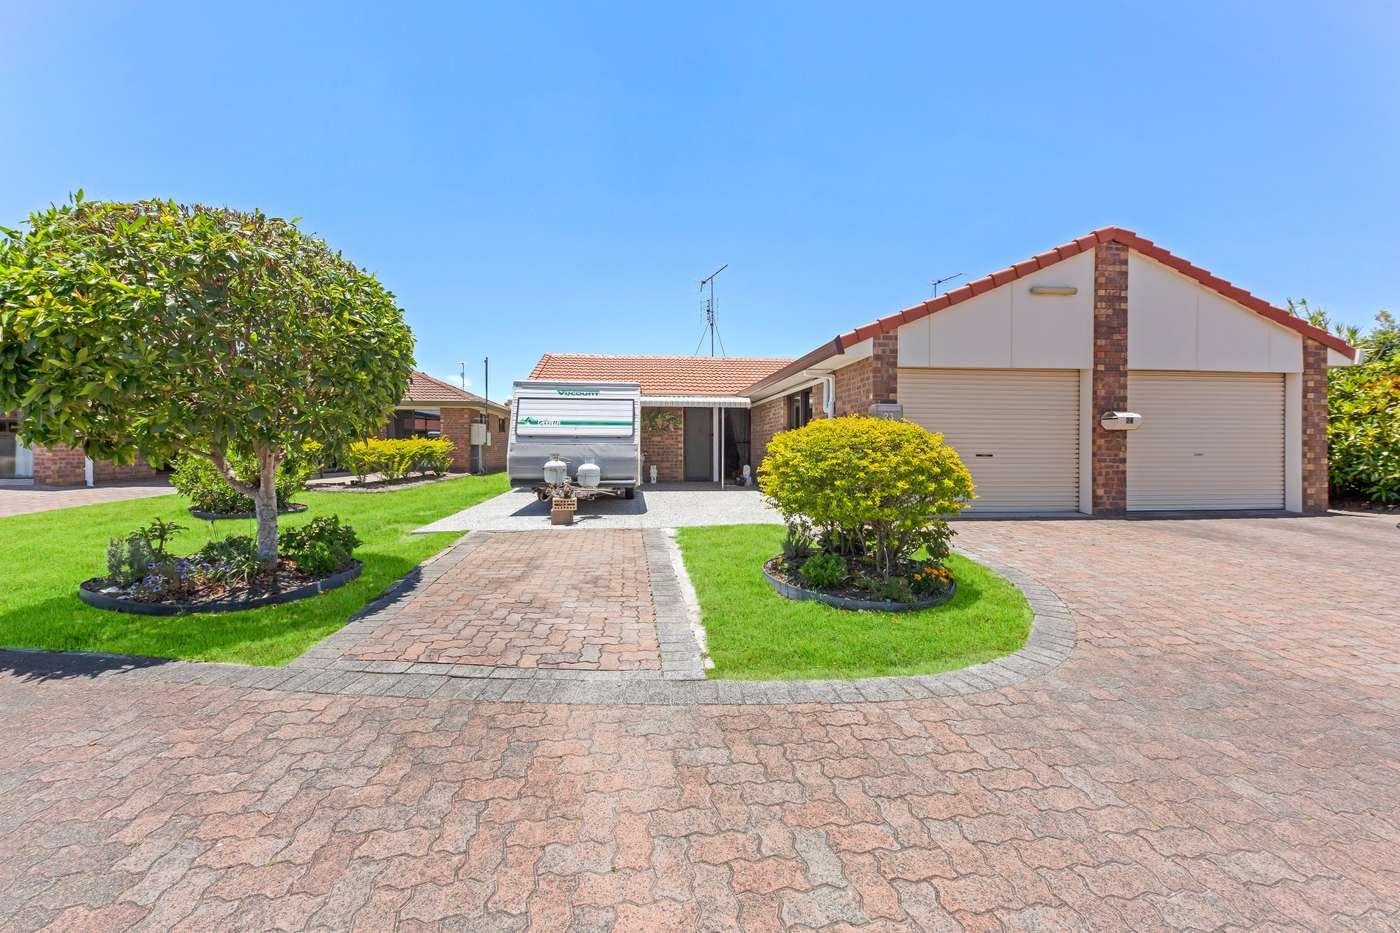 Main view of Homely unit listing, 23/2 Longwood Street, Minyama, QLD 4575